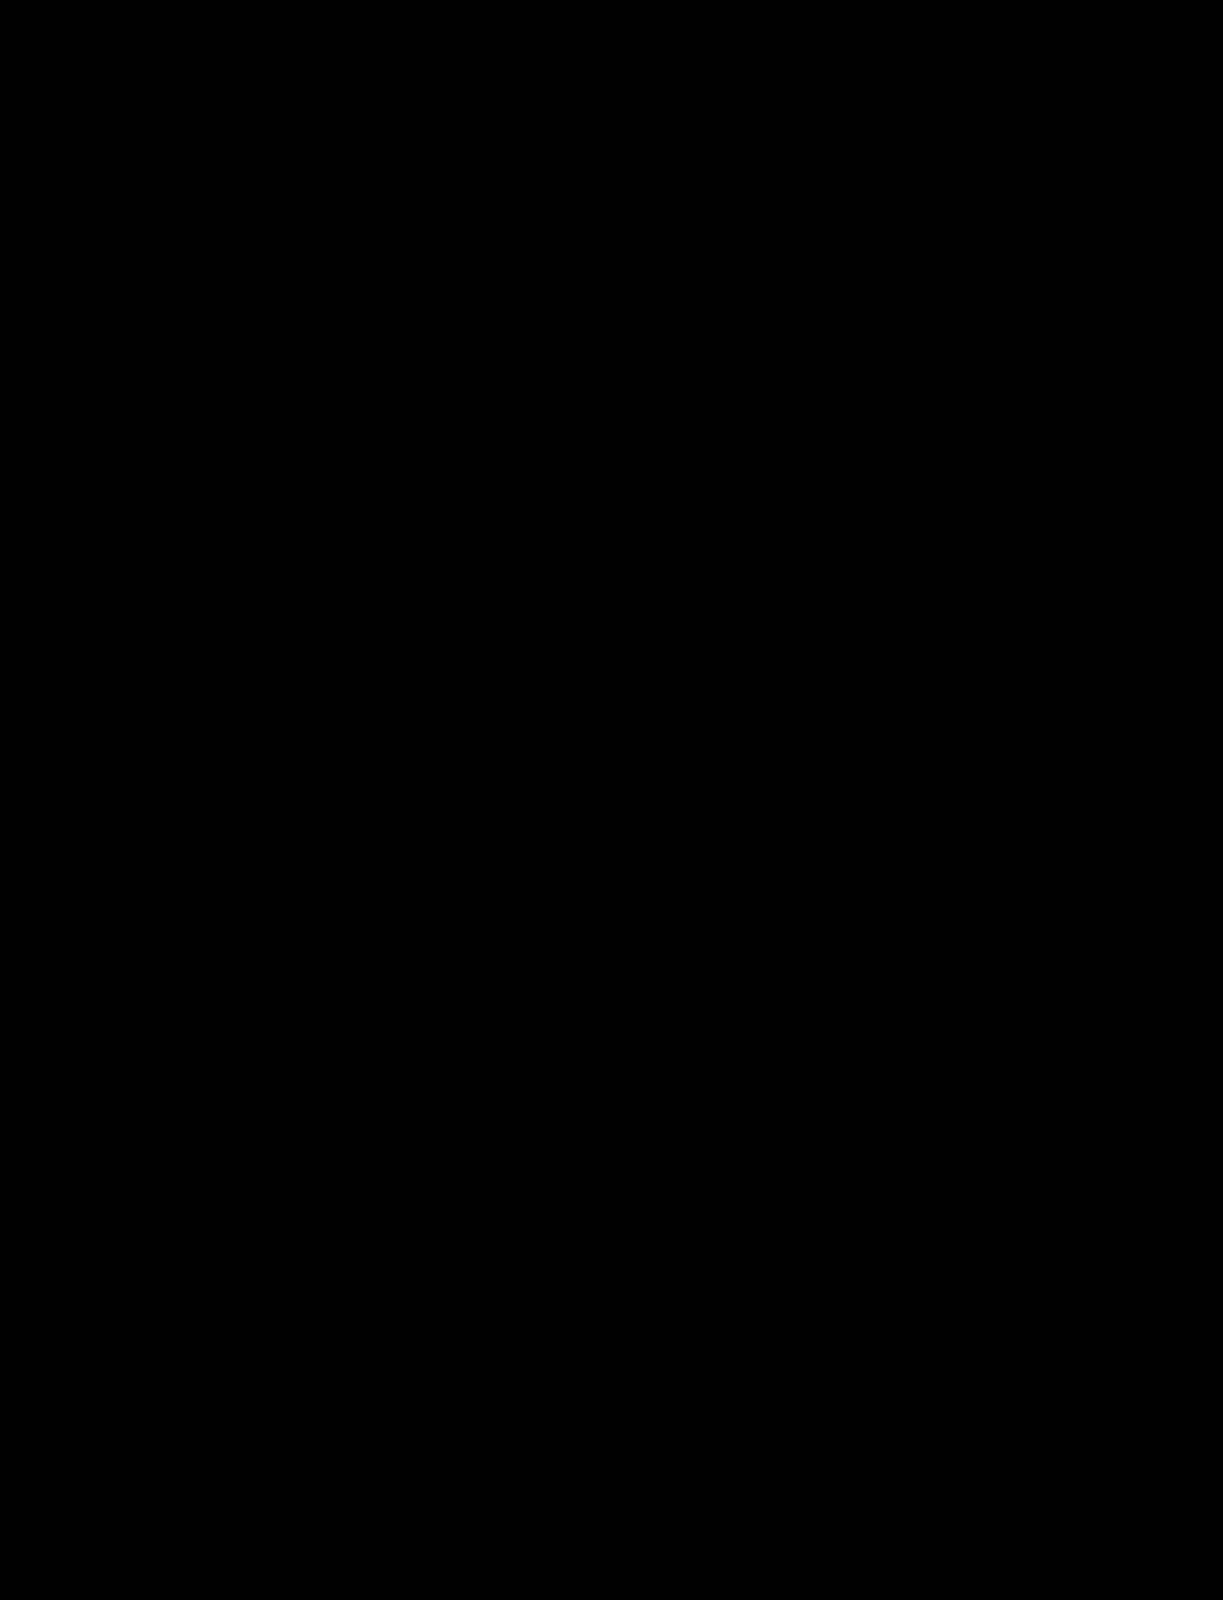 Thanksgiving bible verse clipart black and white clip black and white download Free Vintage Clipart & Christian Word Art   Starsunflower Studio Blog clip black and white download